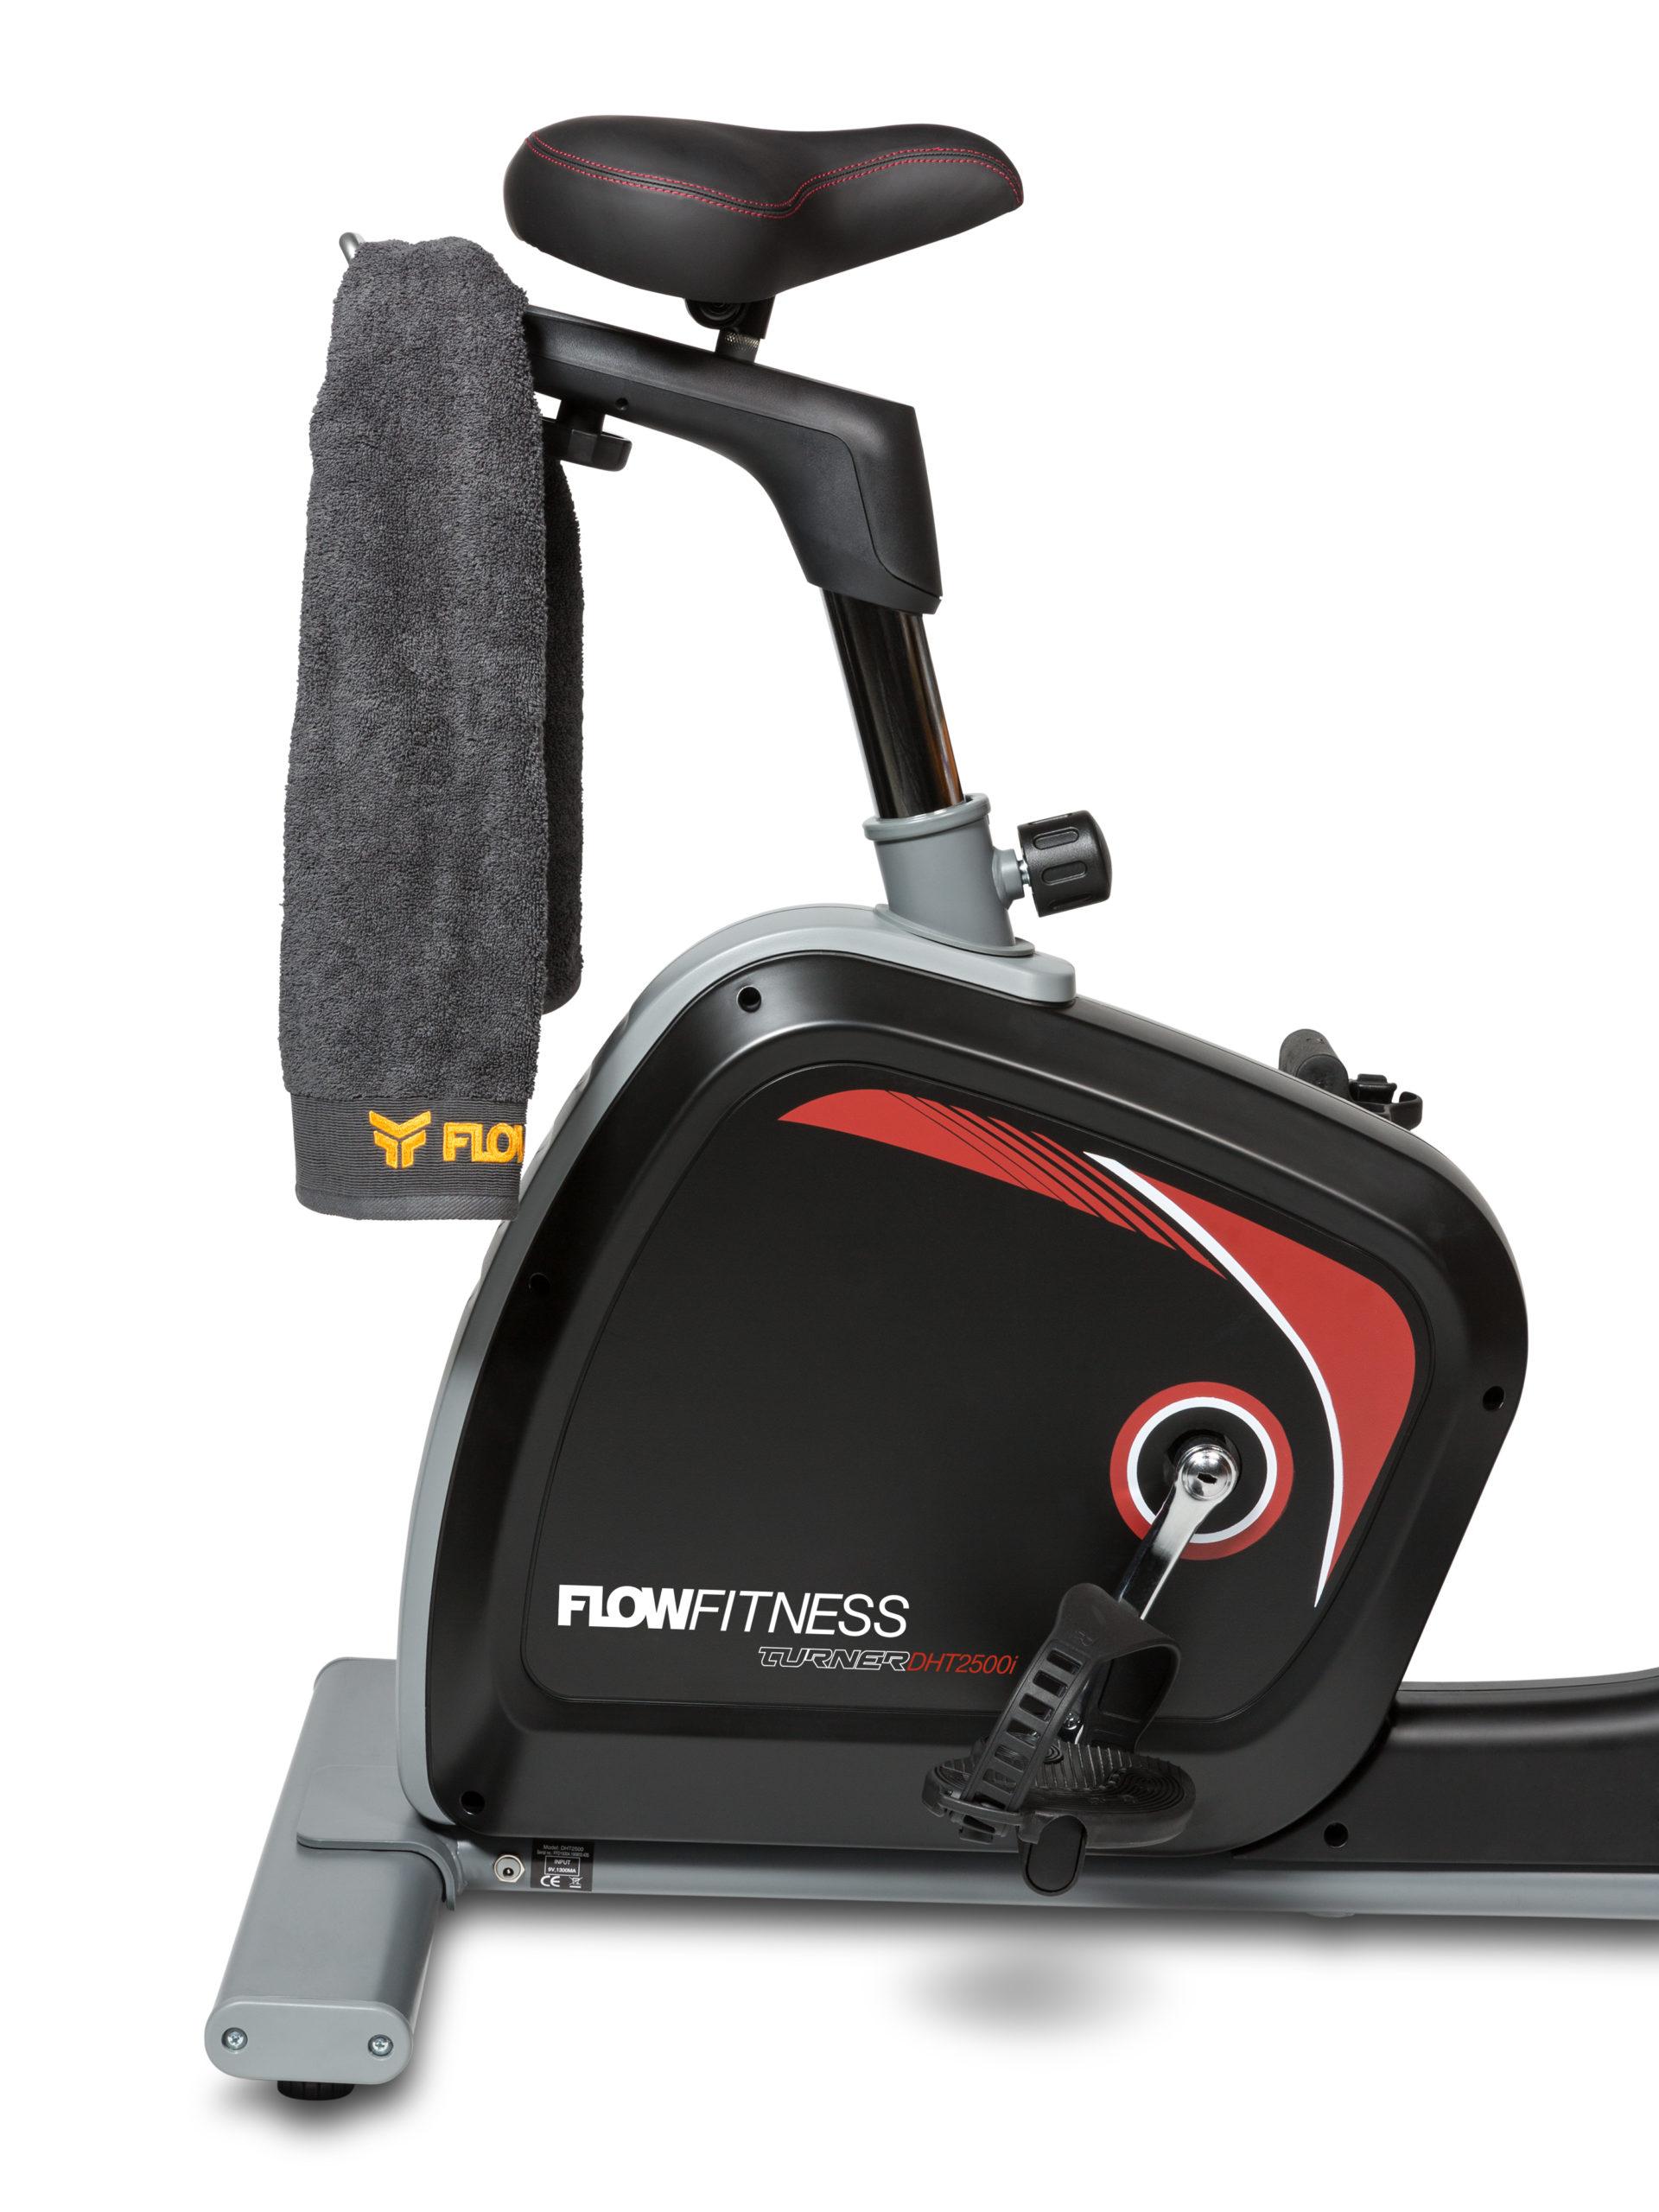 Flow Fitness Tabel Turner DHT2500i Hometrainer 11